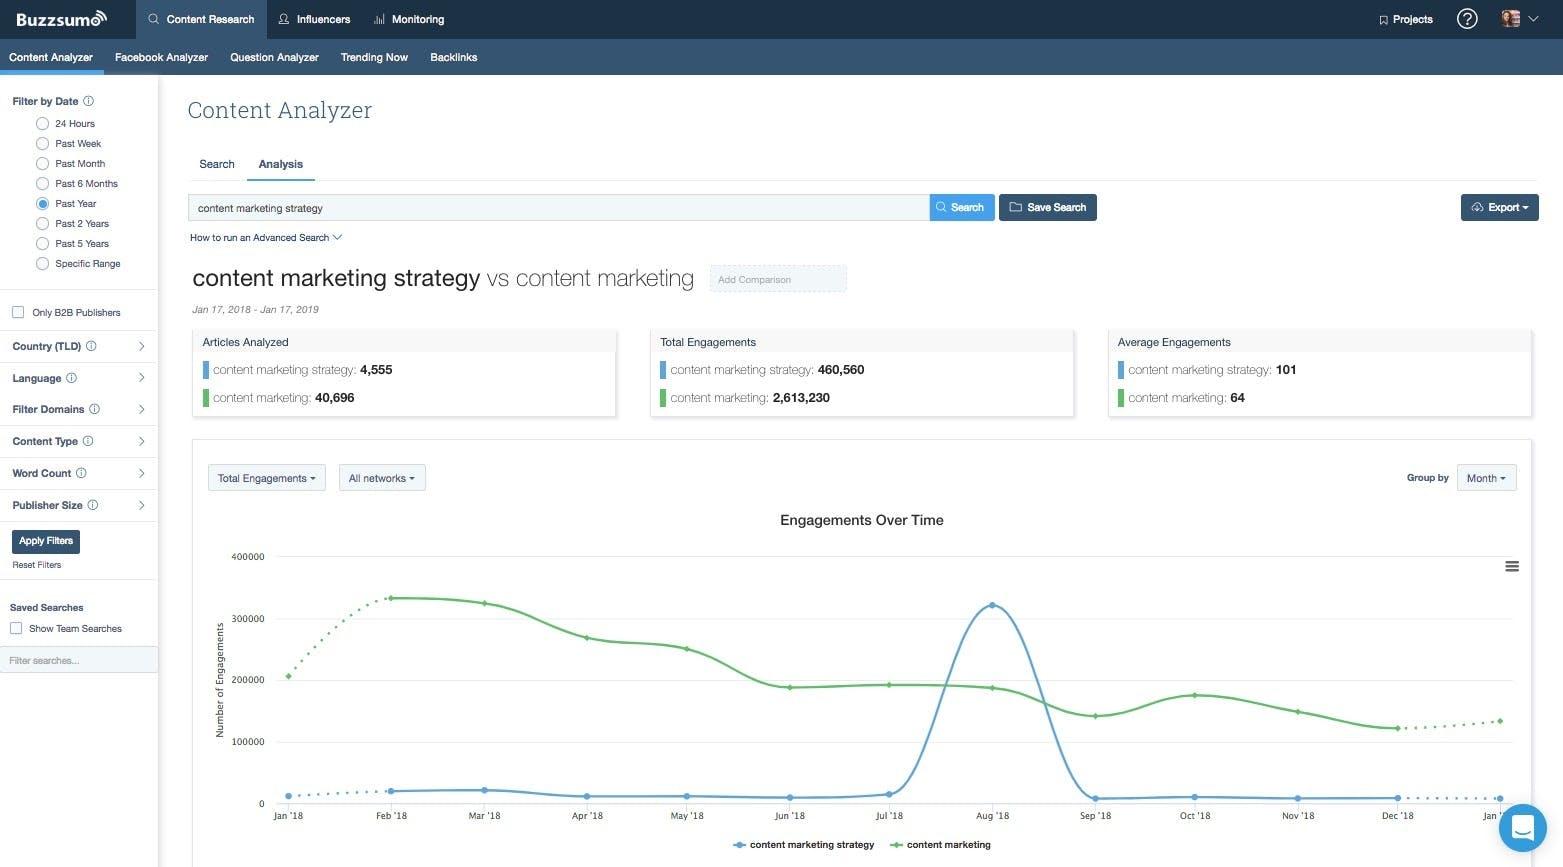 buzzsumo analytics for social media monitoring tool